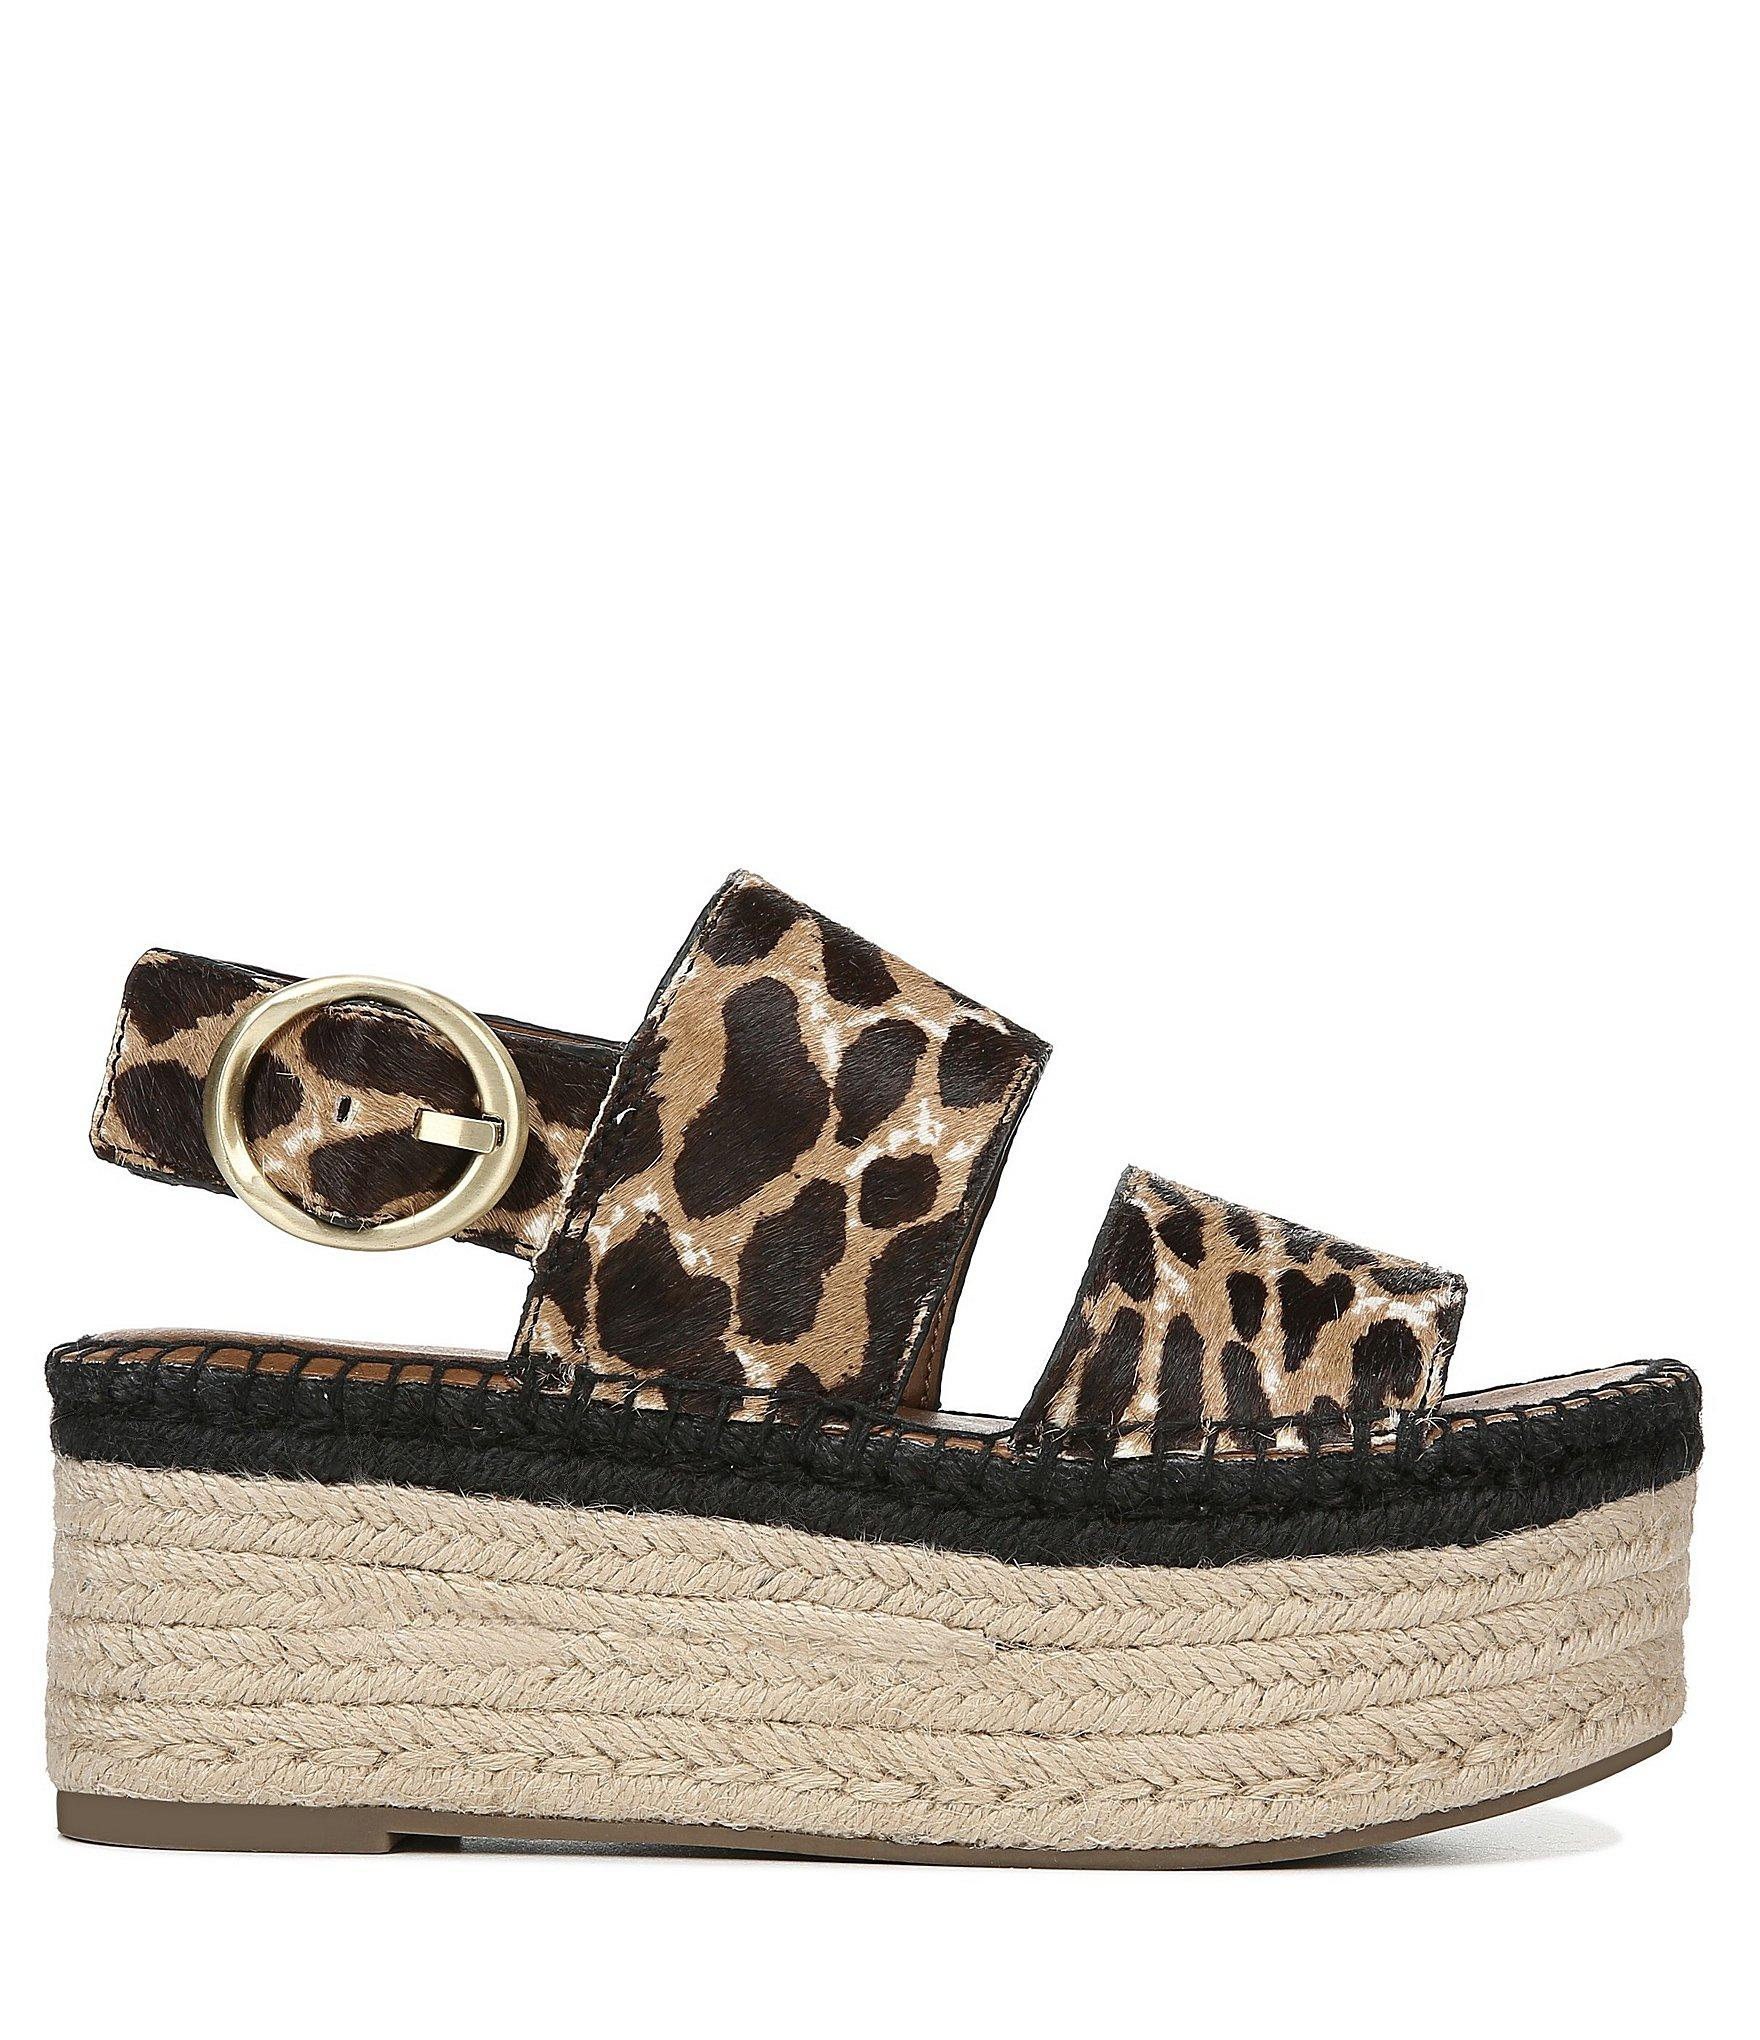 f733370b19 Franco Sarto - Brown Sarto By Mariana Leopard Print Calf Hair Espadrille  Flatform Sandals - Lyst. View fullscreen